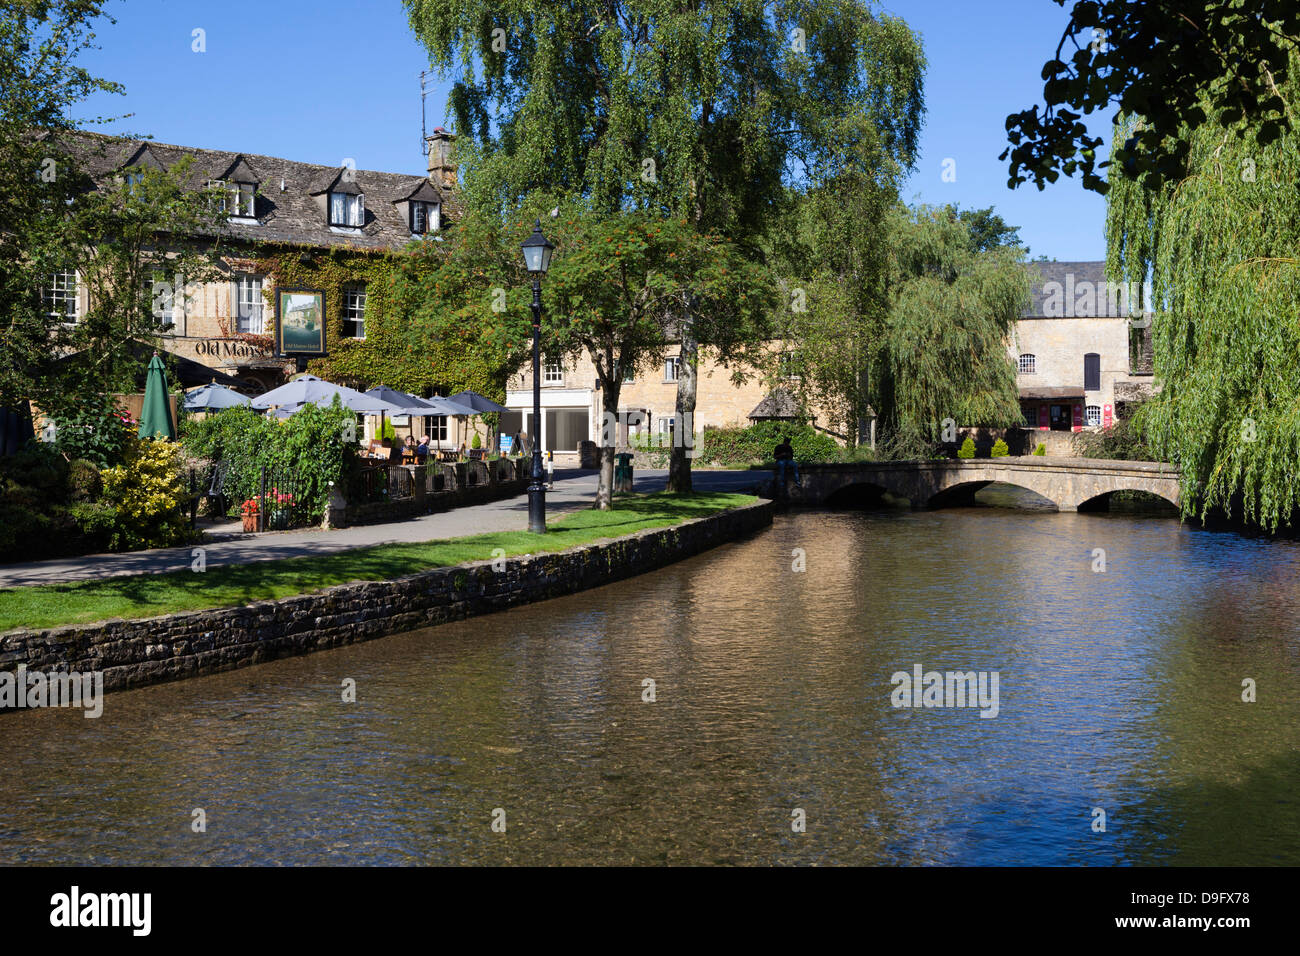 Ver a lo largo del río Windrush, Bourton-on-the-agua, Gloucestershire, Cotswolds, Inglaterra, Reino Unido. Foto de stock